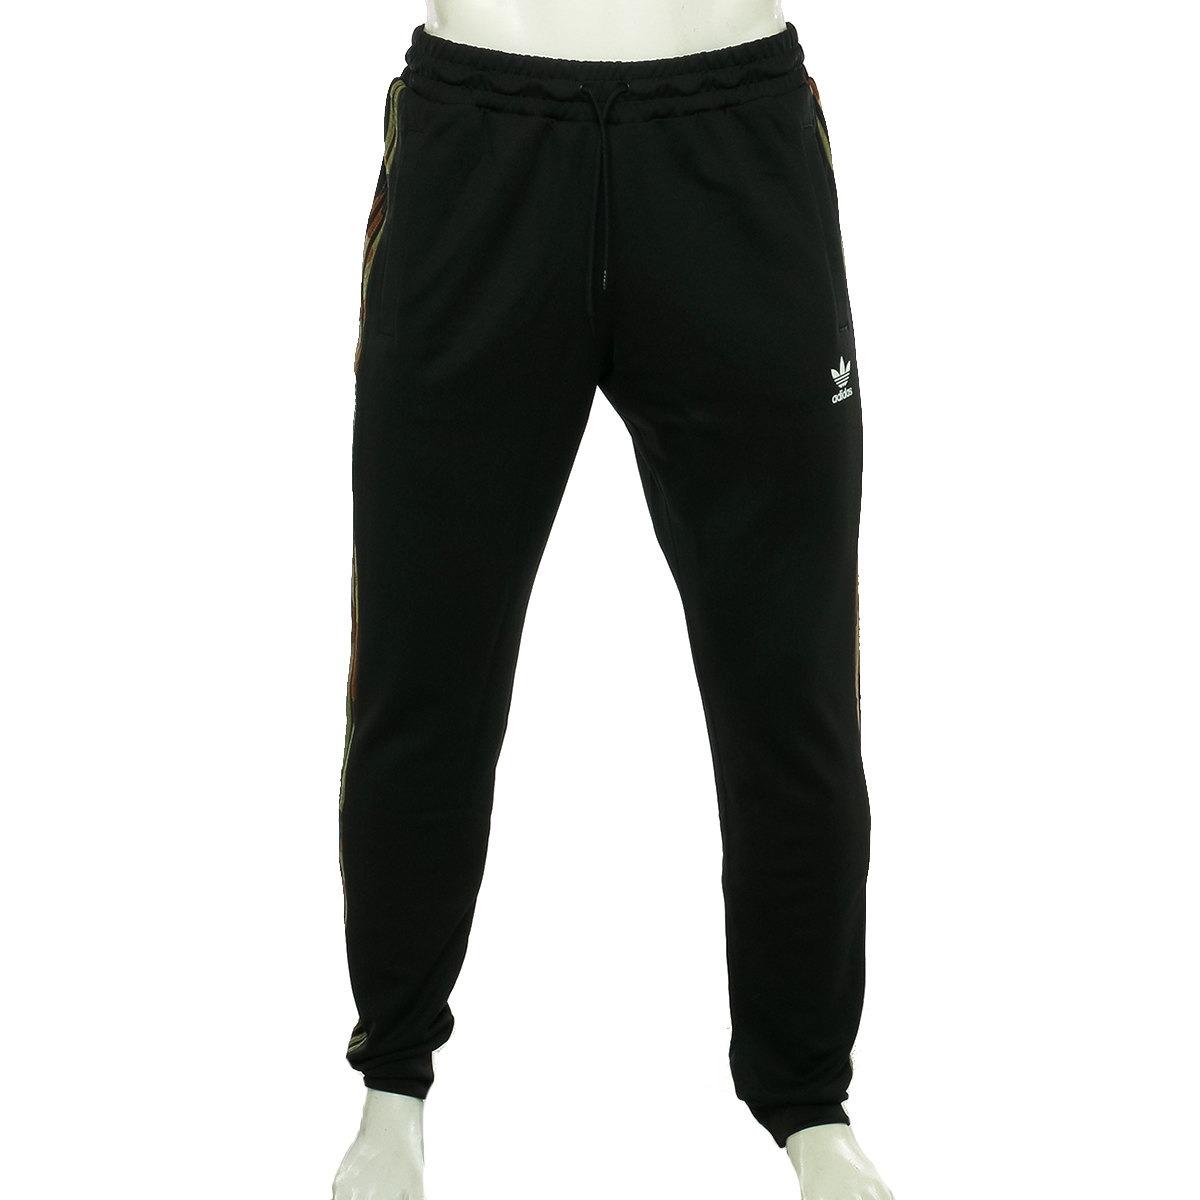 Cuffed Track Superstar Adidas Pantalon Originals USzVqpMG